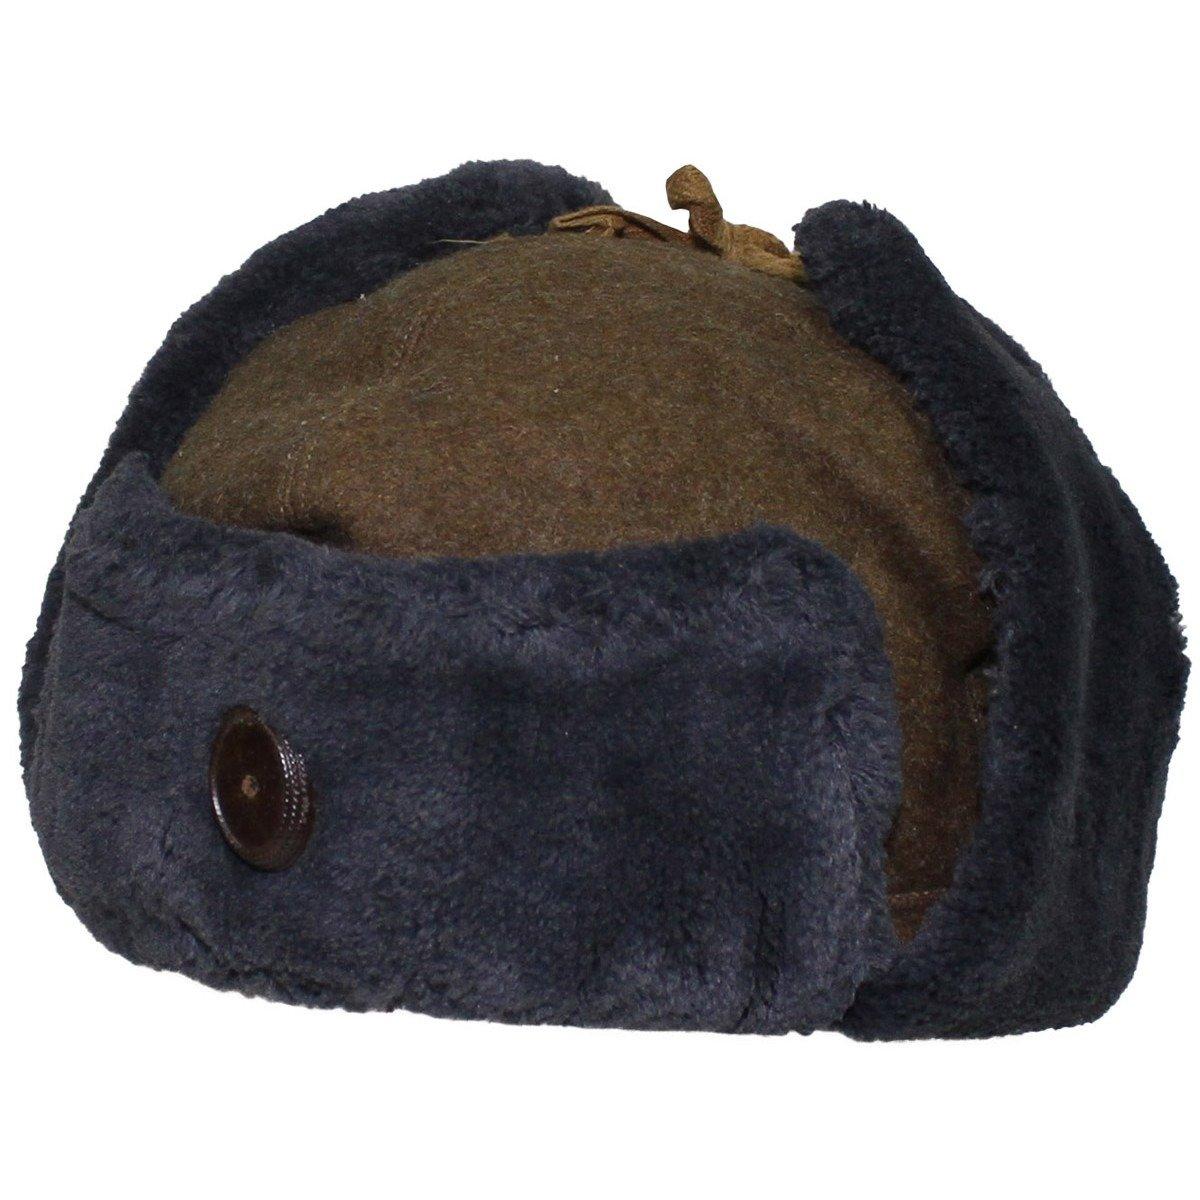 8887b8c0953c34 Hungarian Winter Cap, OD green, like new | Military Surplus \ Used Clothing  \ Headwear \ Winter Caps Military Surplus \ Used Clothing \ Headwear \  Other ...